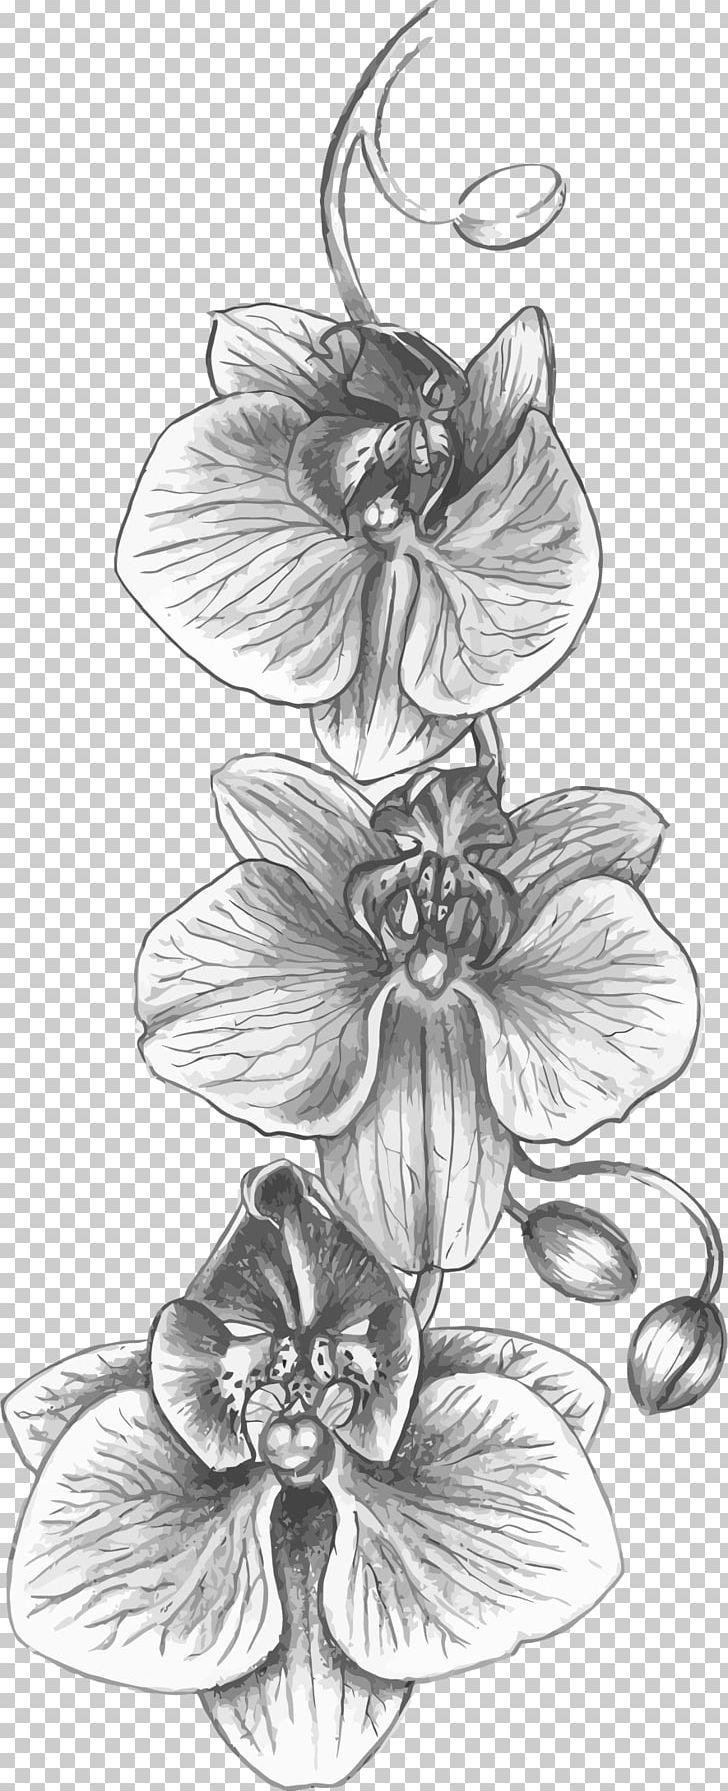 Cattleya Orchids Tattoo Drawing Flower Png Clipart Artwork